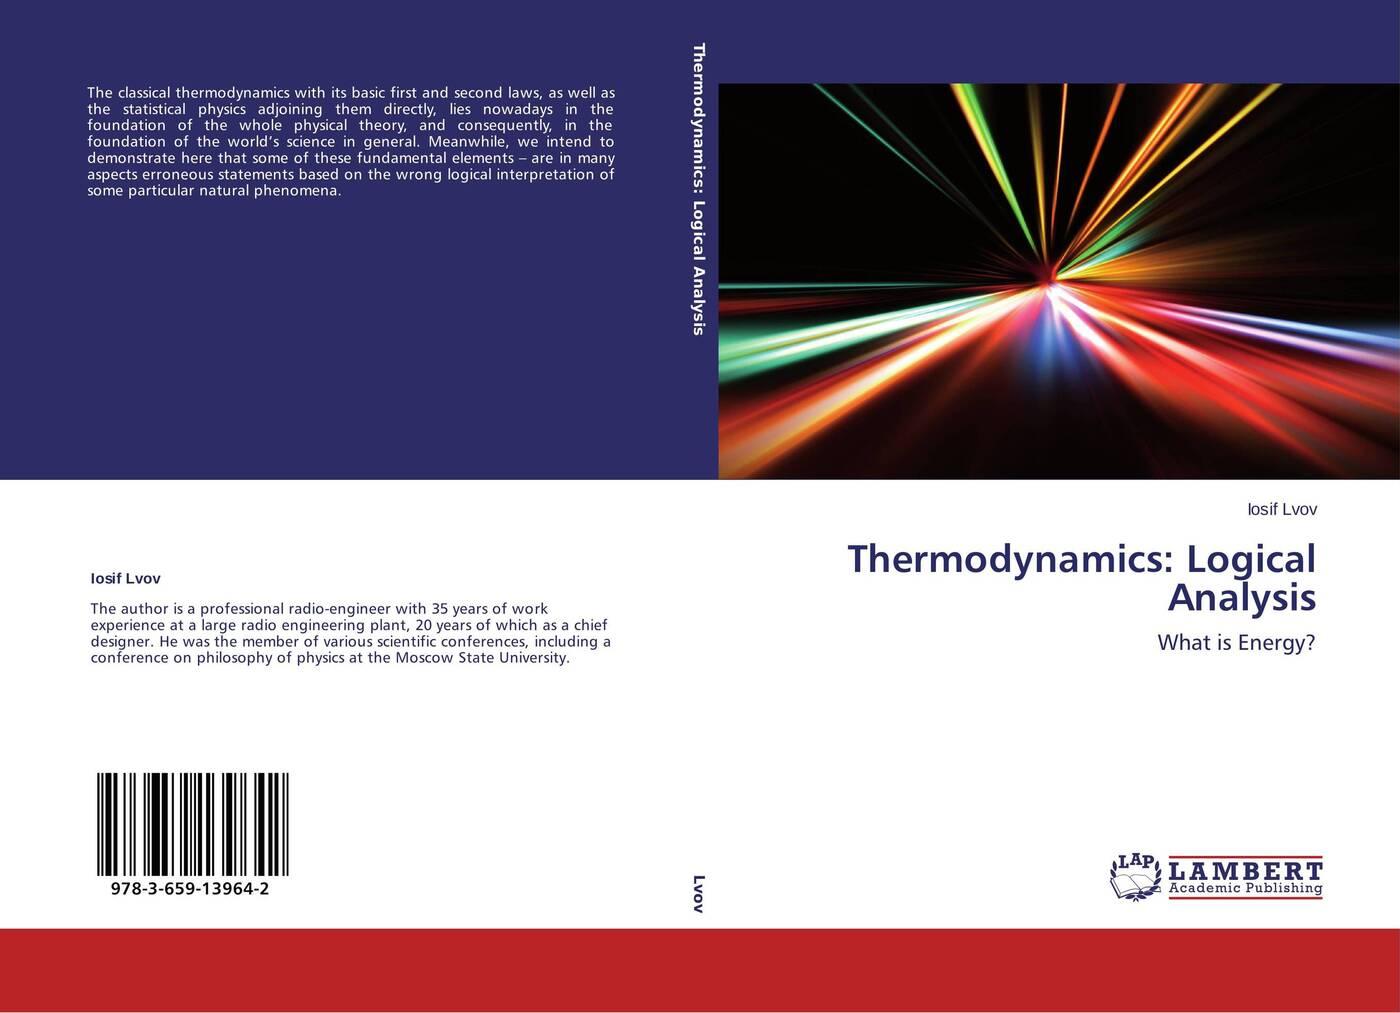 Iosif Lvov Thermodynamics: Logical Analysis statistical physics and thermodynamics